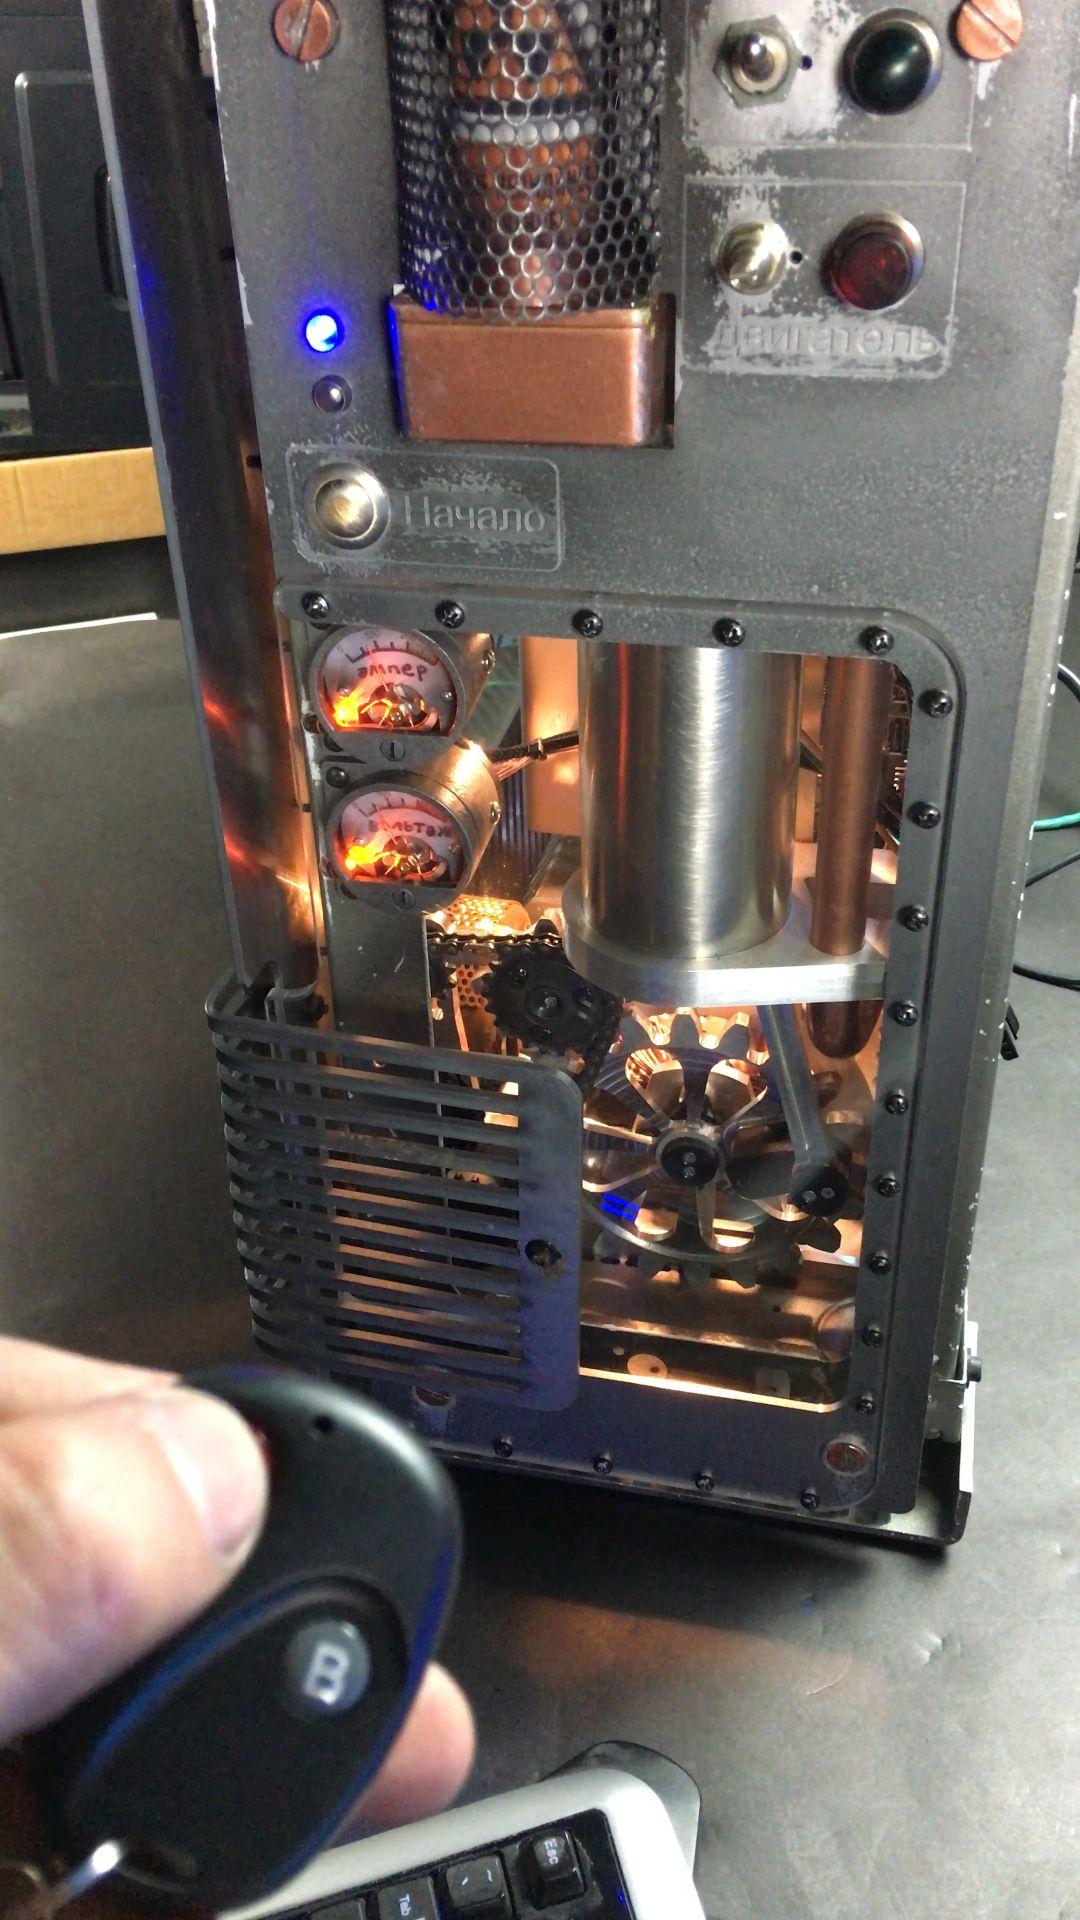 Steampunk RTX 3090 PC Build Case Mod